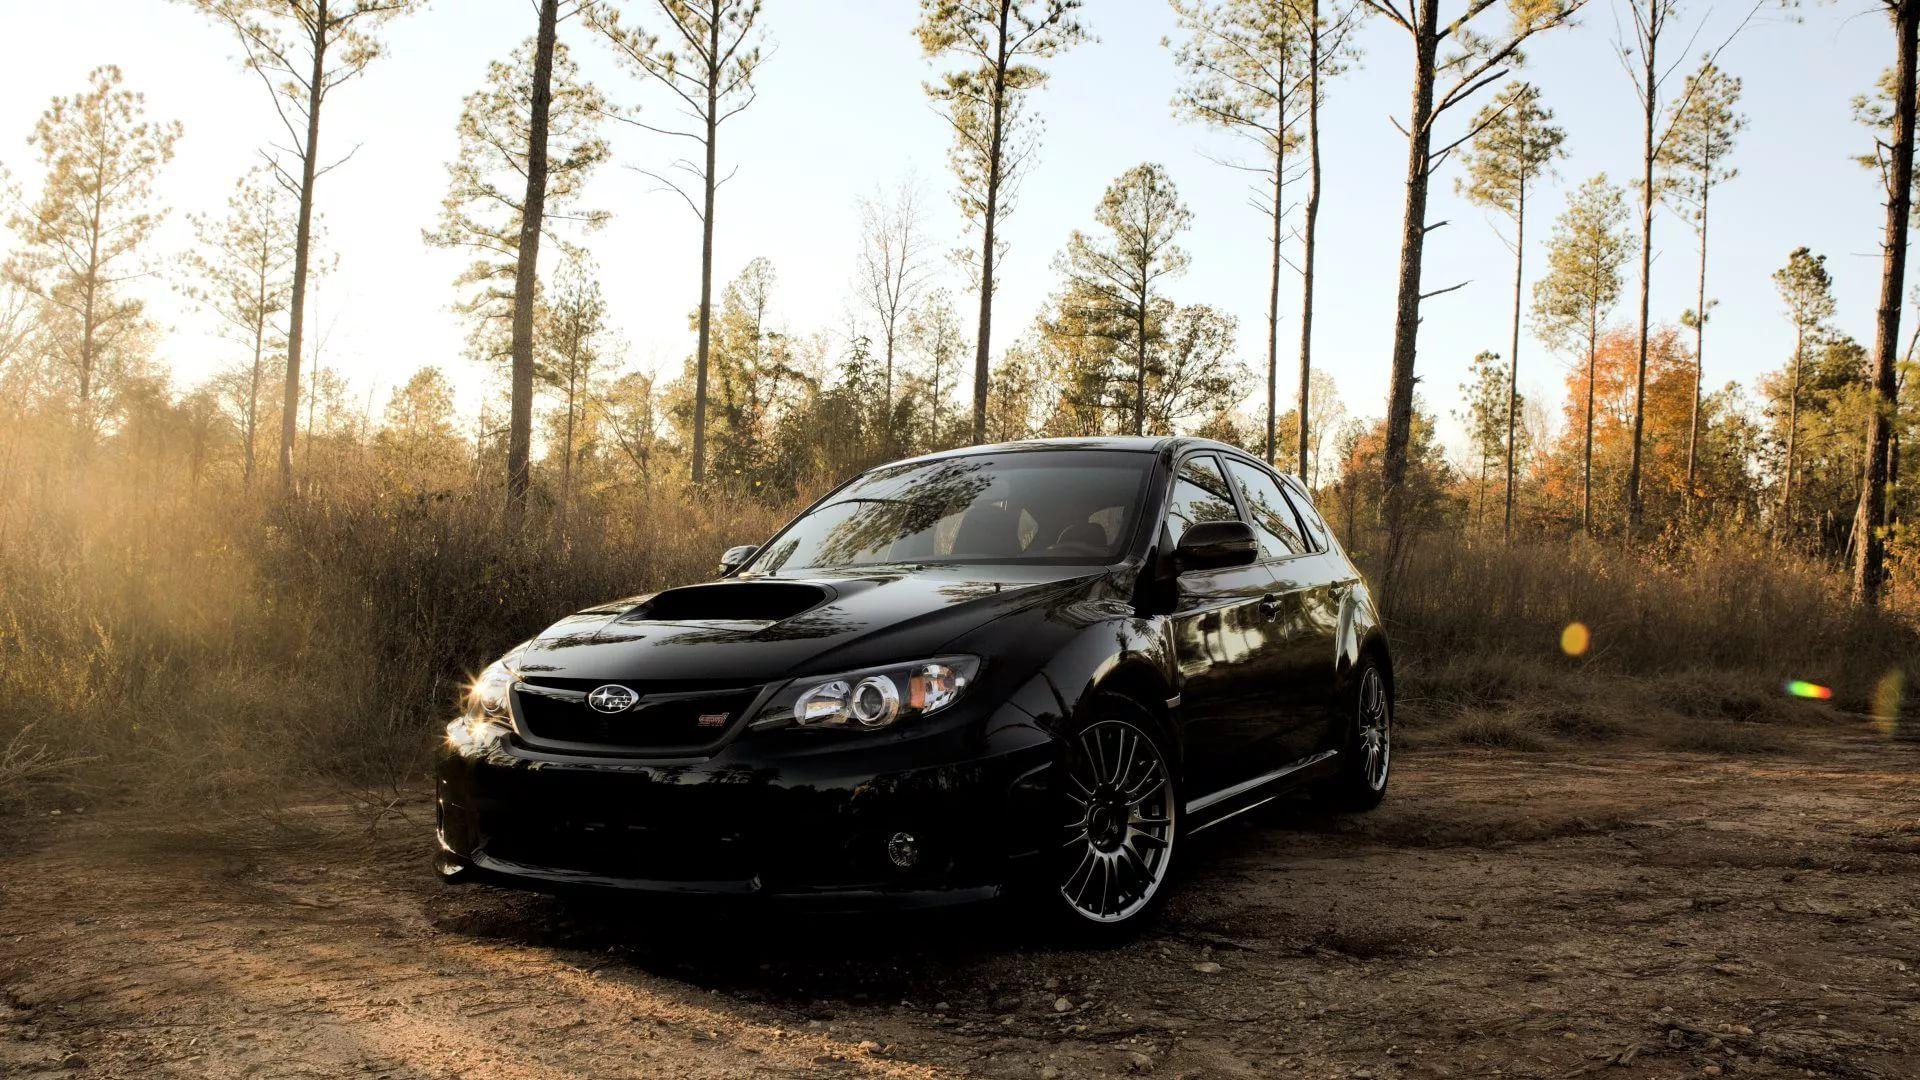 Subaru WRX Wallpapers (23+ images